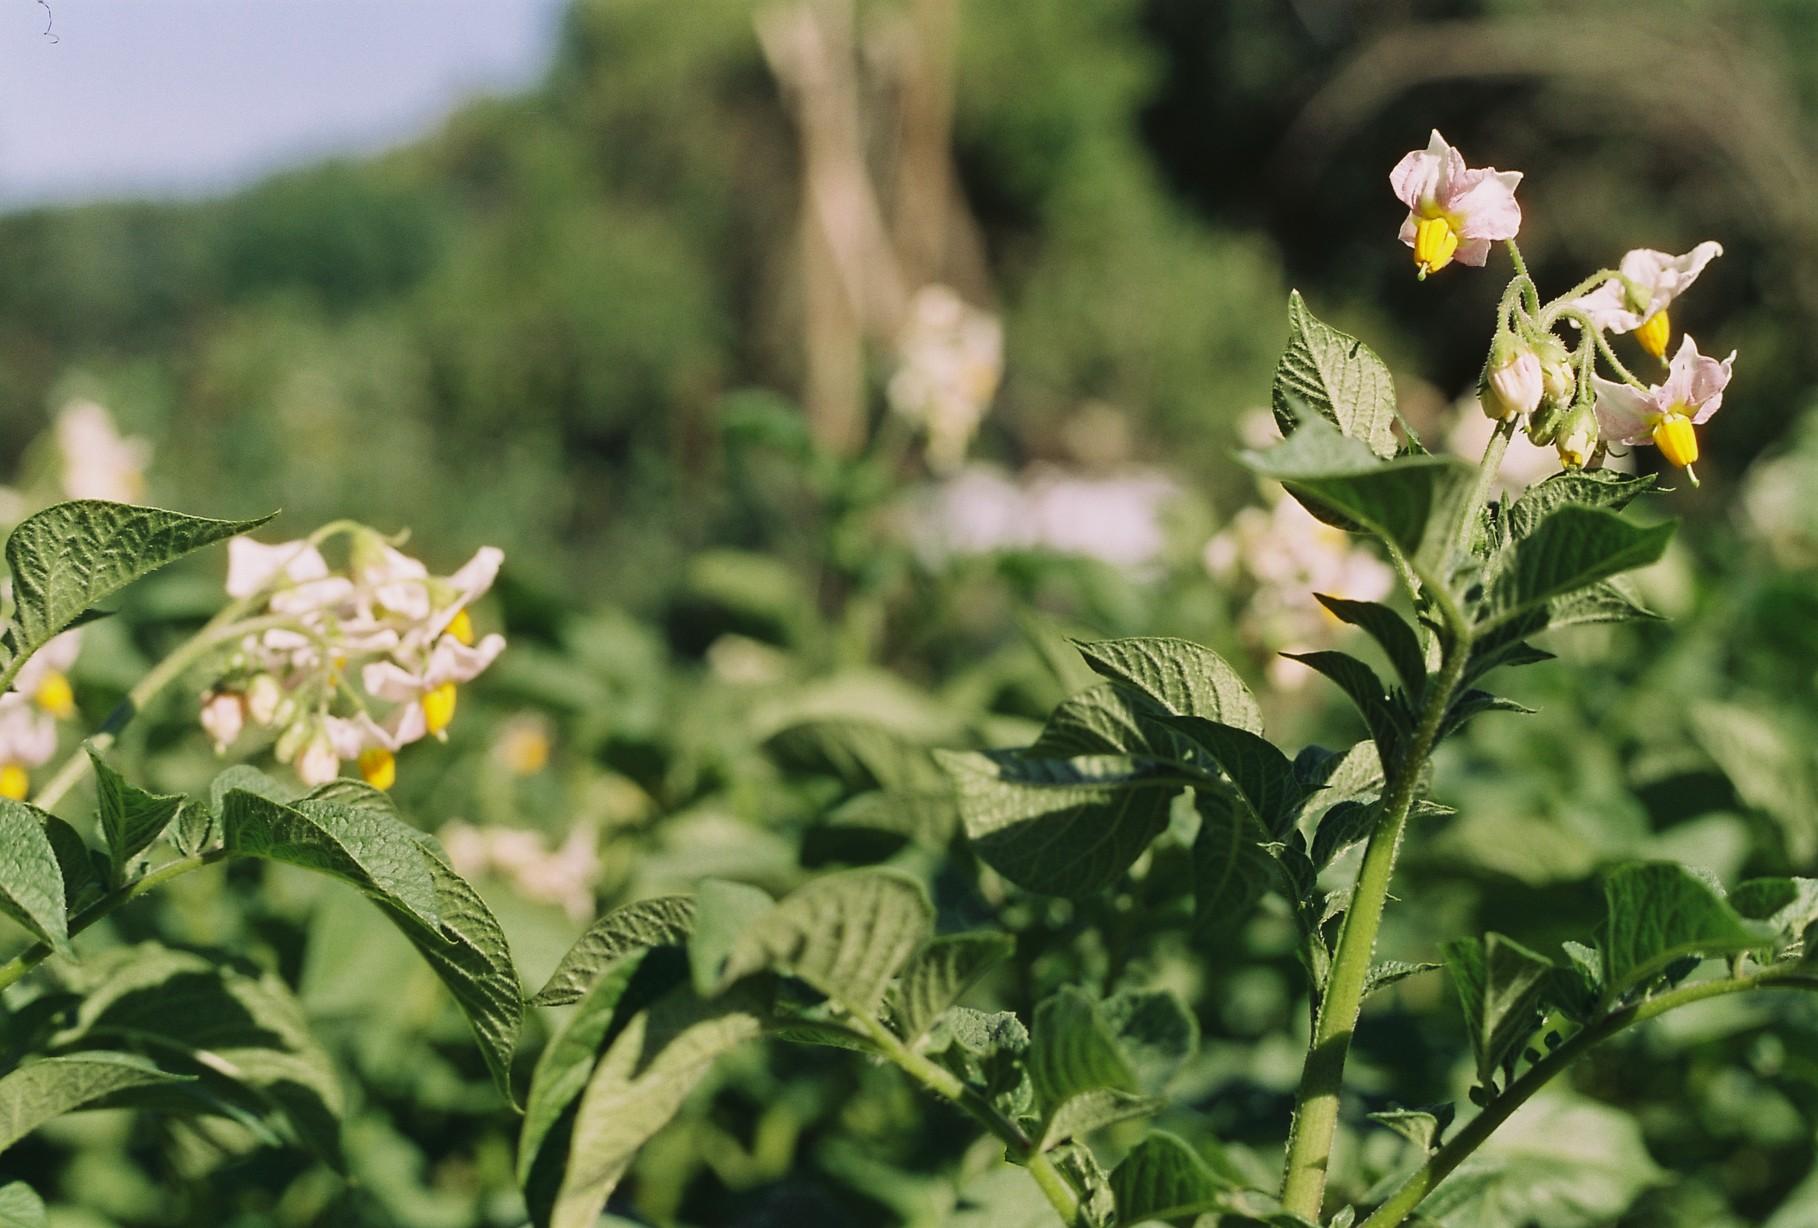 Garten Sommer Kartoffel Blüte